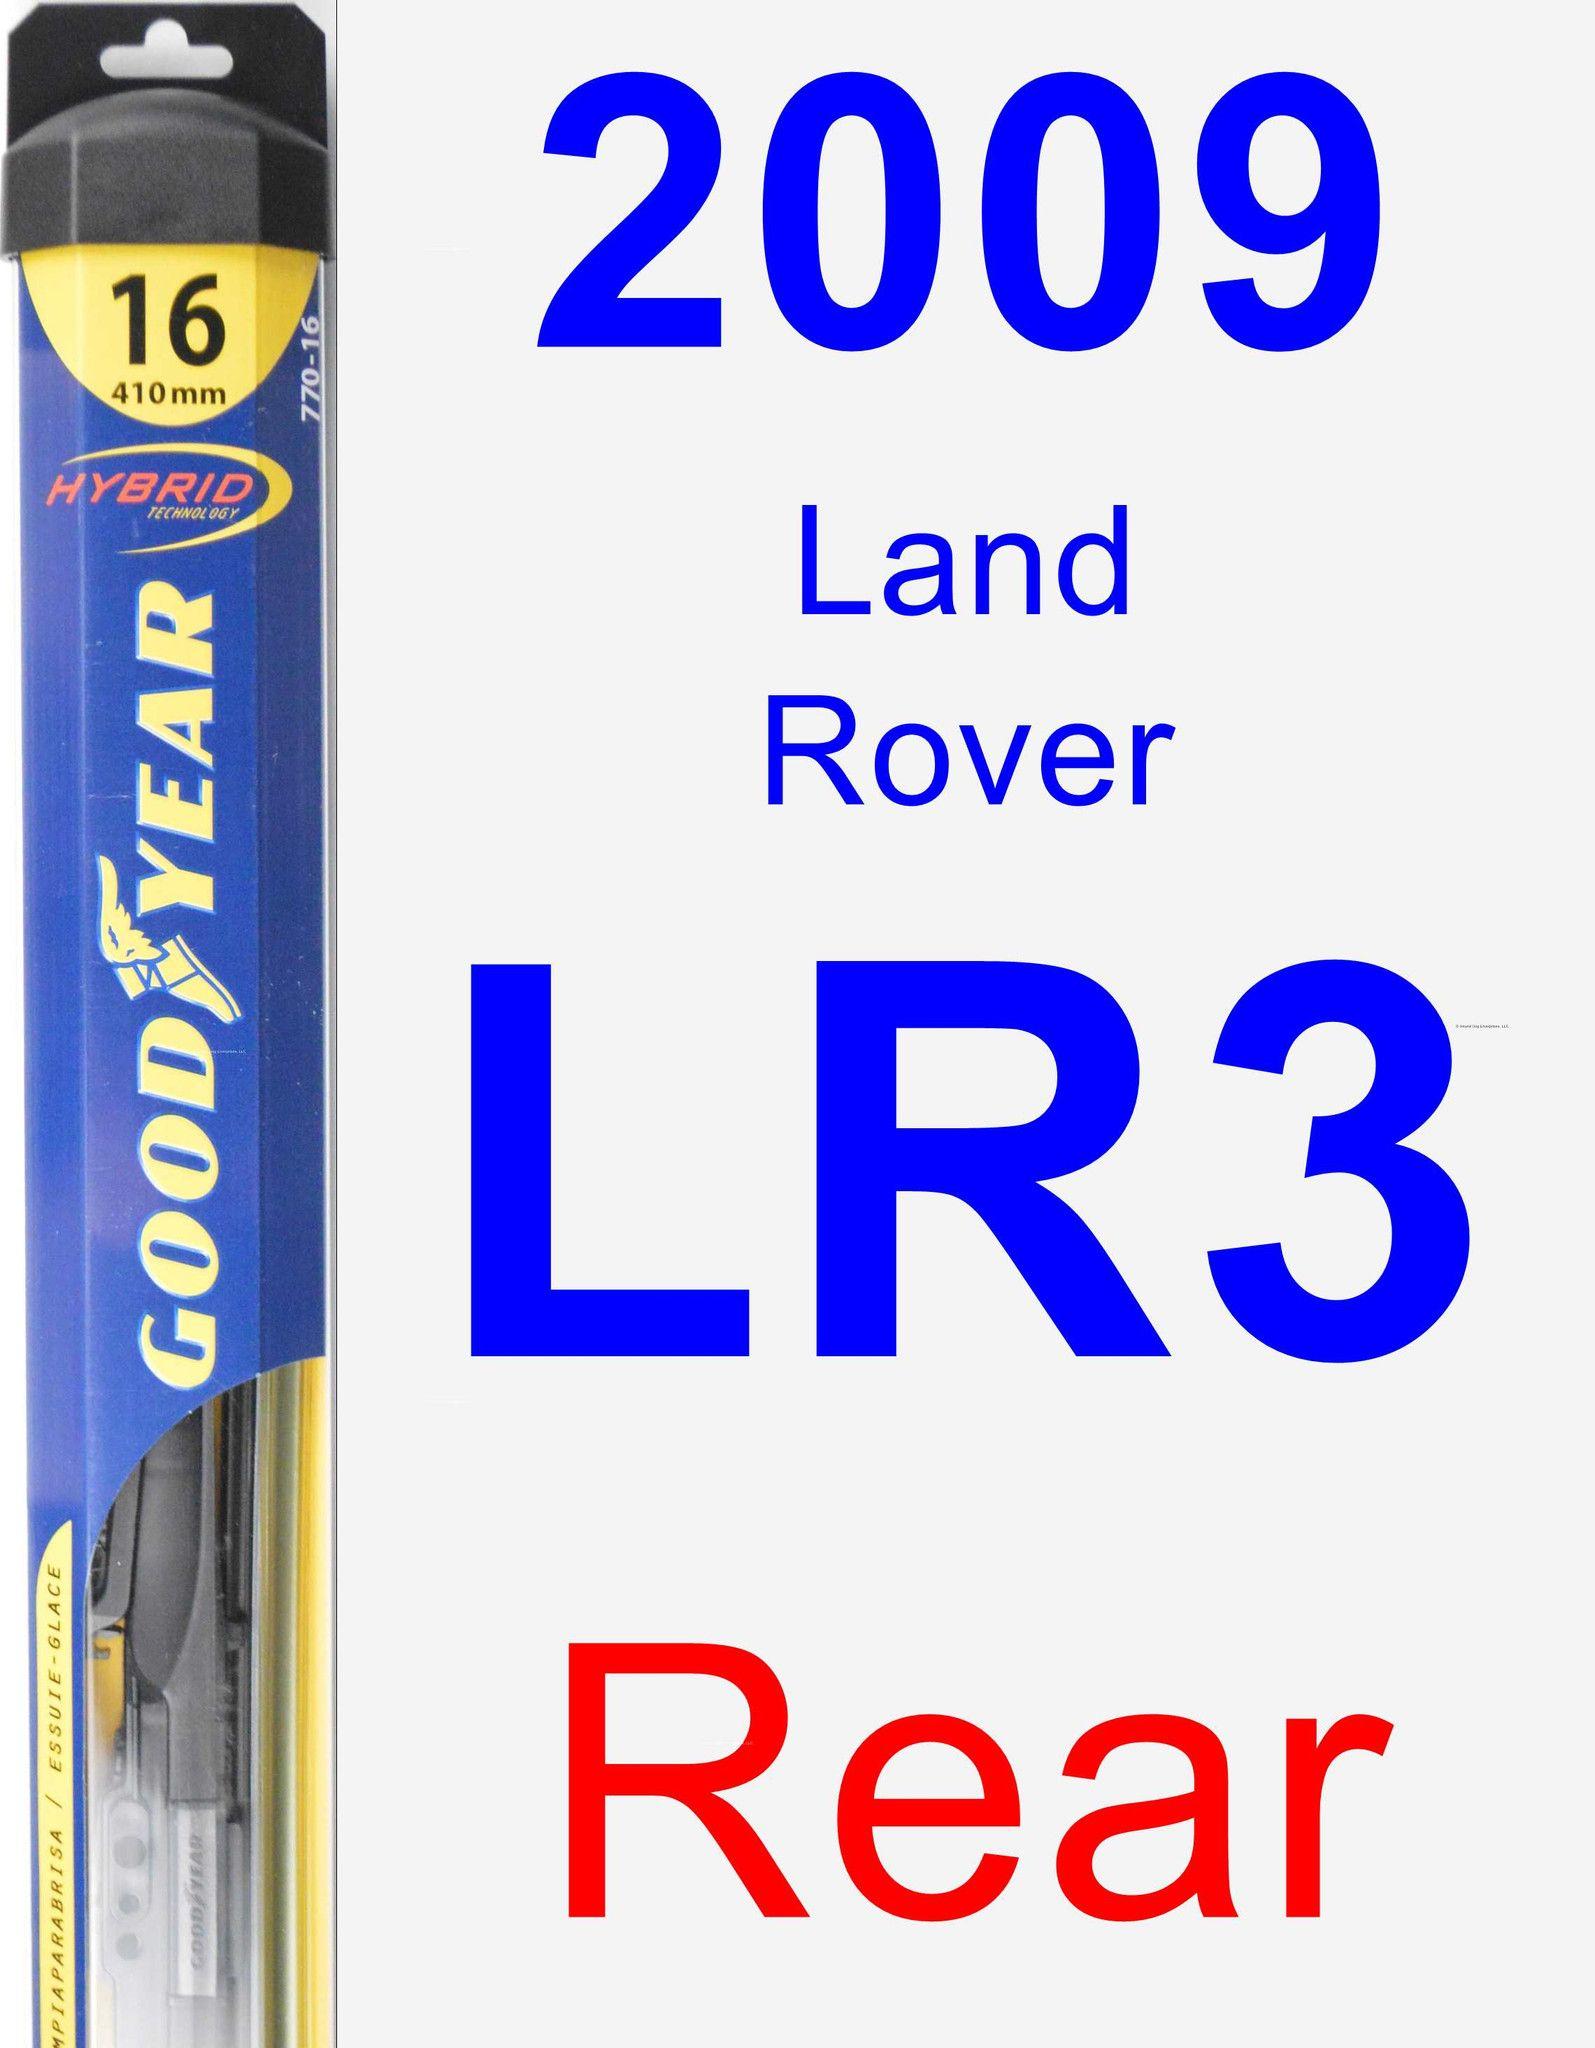 Wiper Blade for 2009 Land Rover LR3 Hybrid